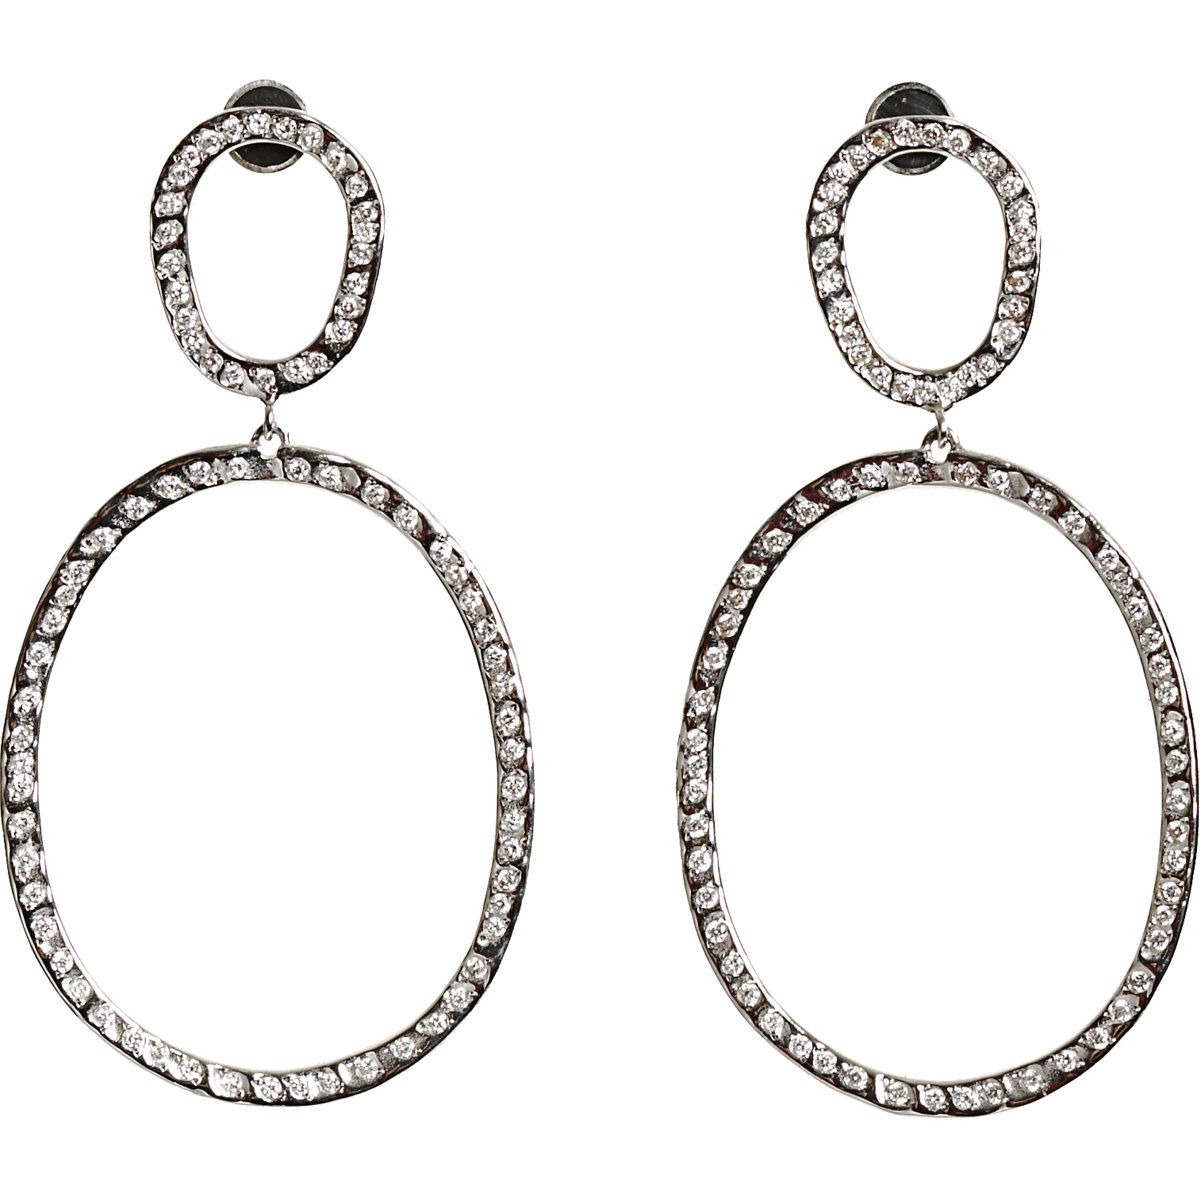 This is so meeee....Ileana Makri White Gold & Diamond Again Hoop Earrings at Barneys.com